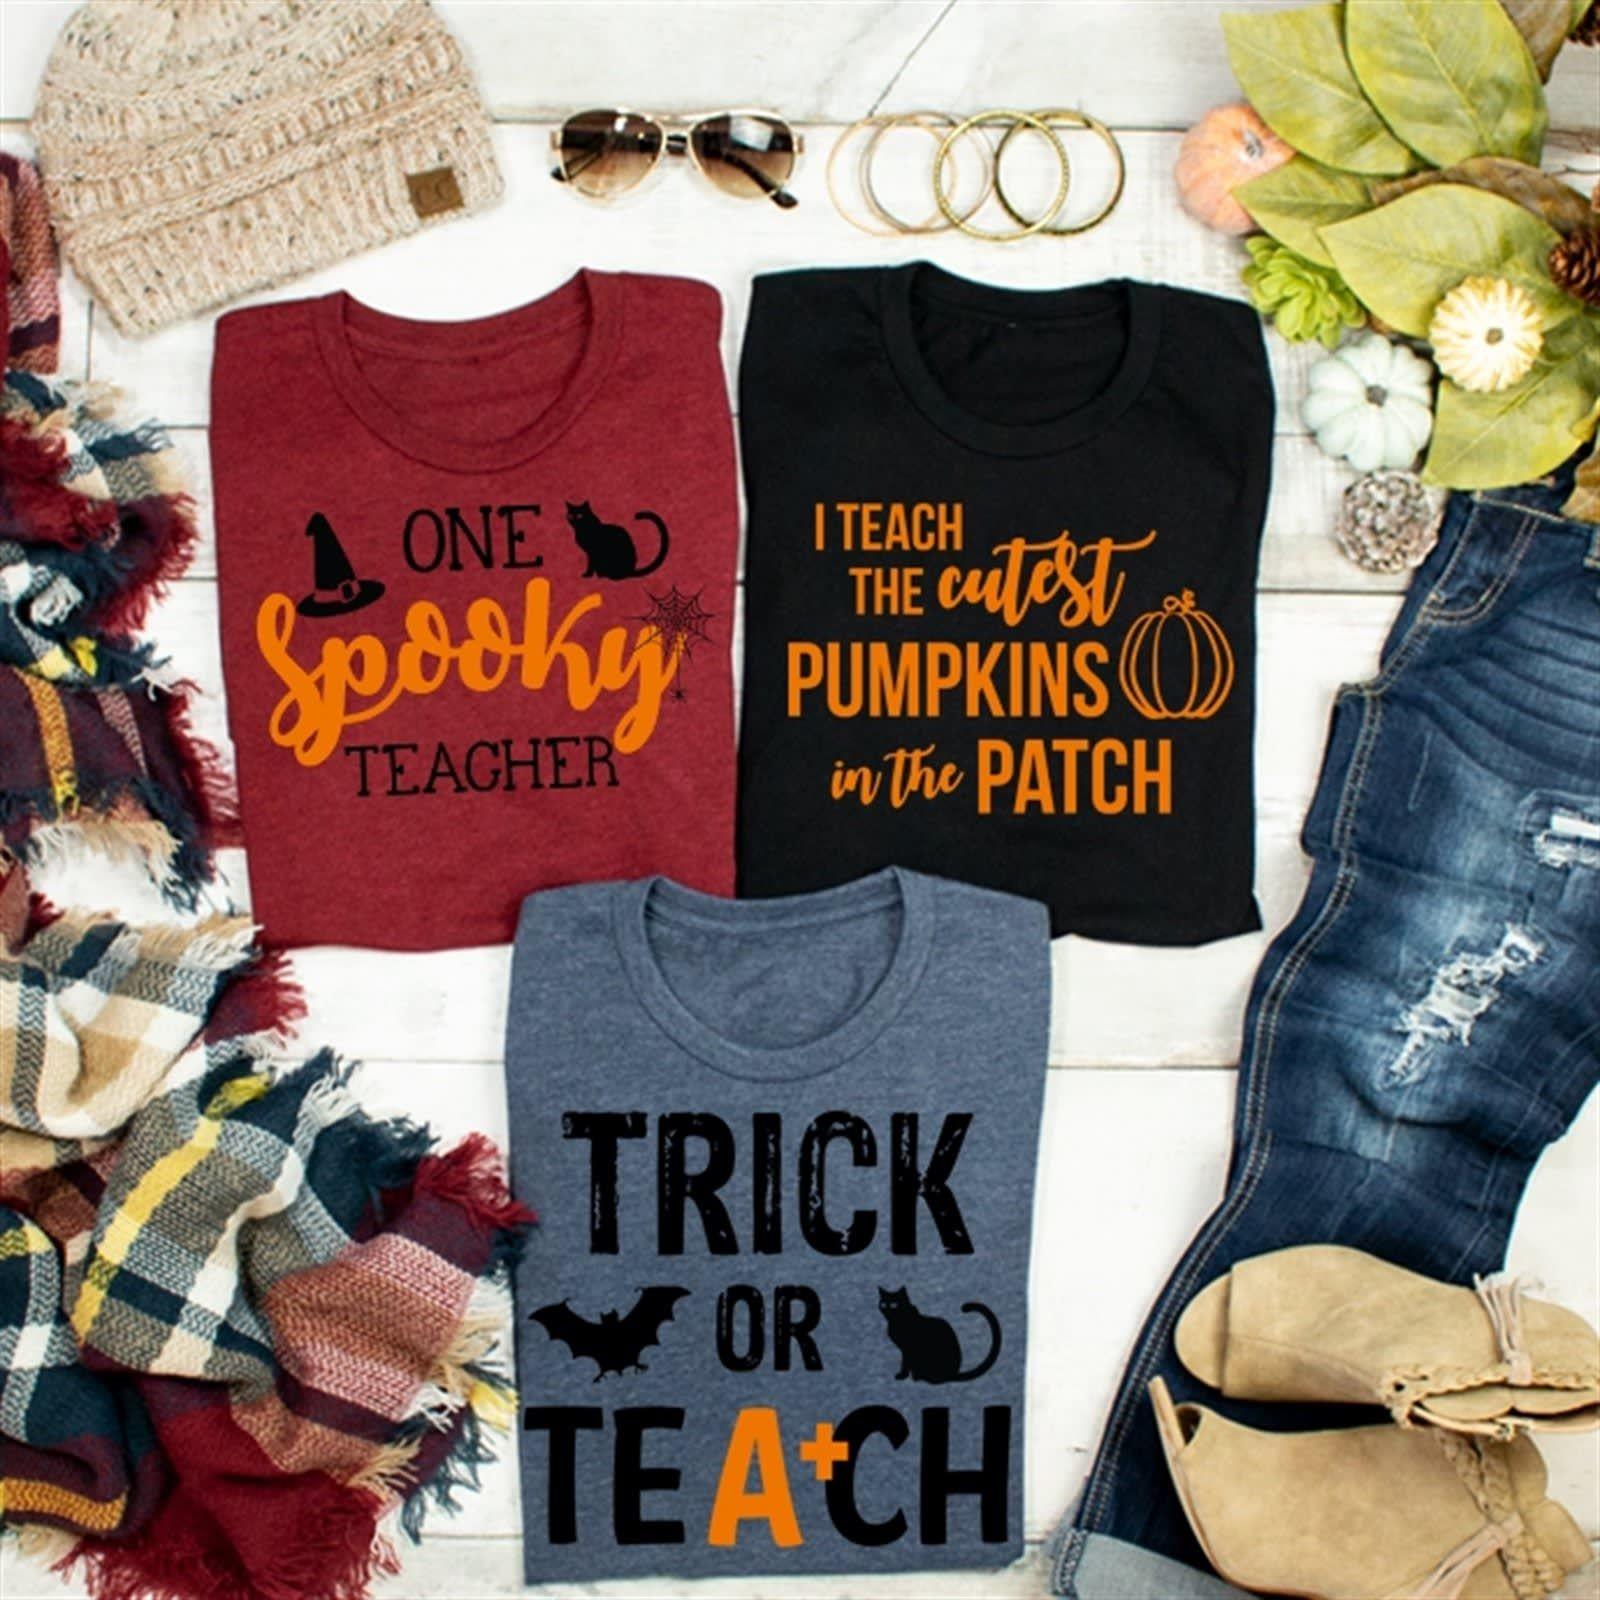 Trick or Teach Tees Teaching shirts, Fall gifts, Teaching